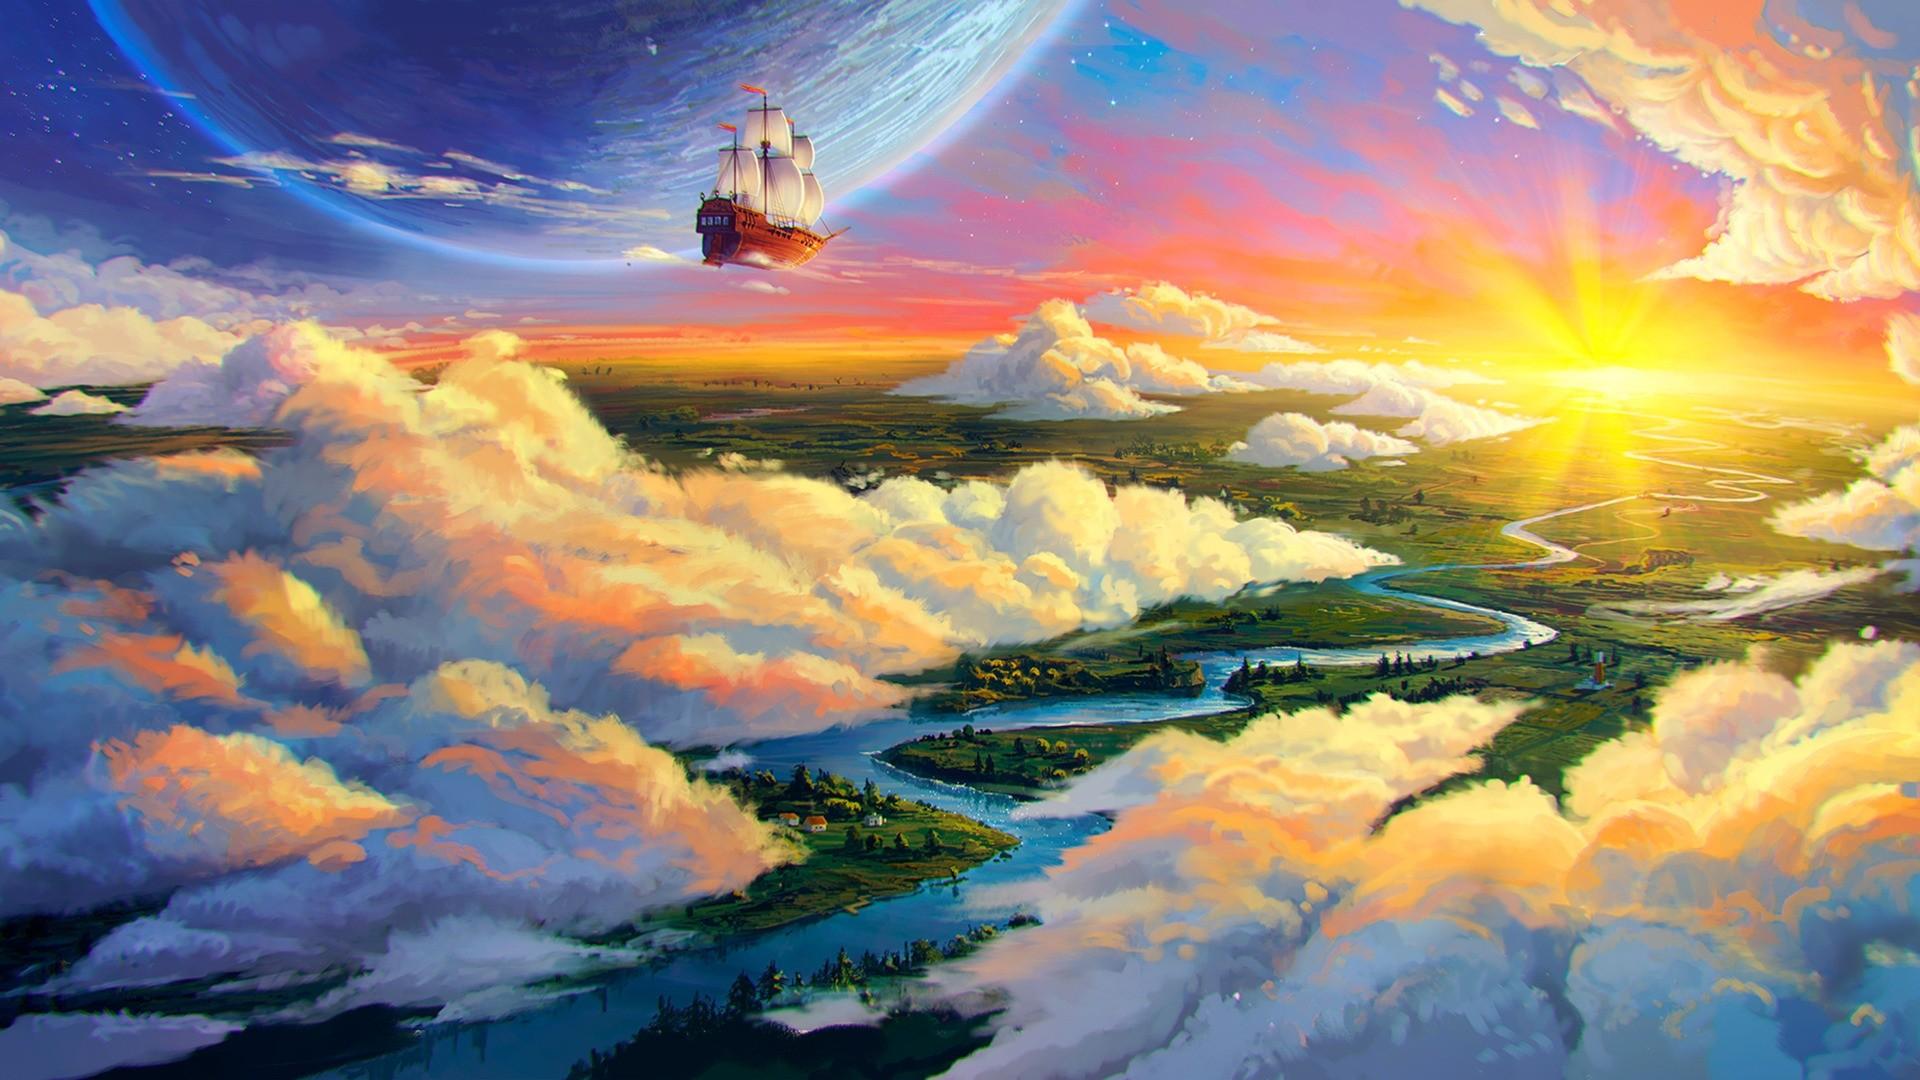 Celestial hd wallpaper download